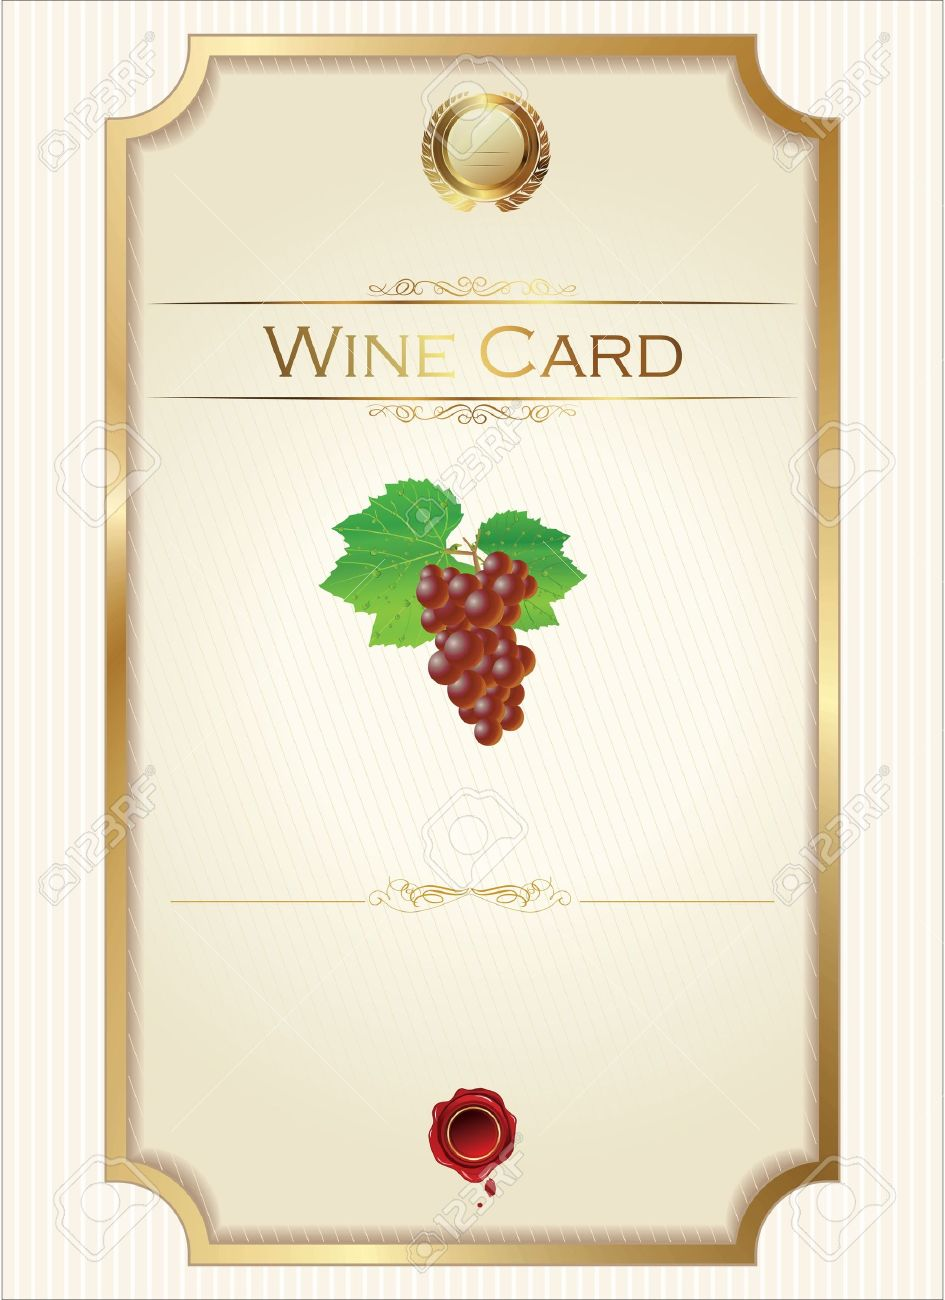 945x1300 Fdbdfaedbc Wine Label Template